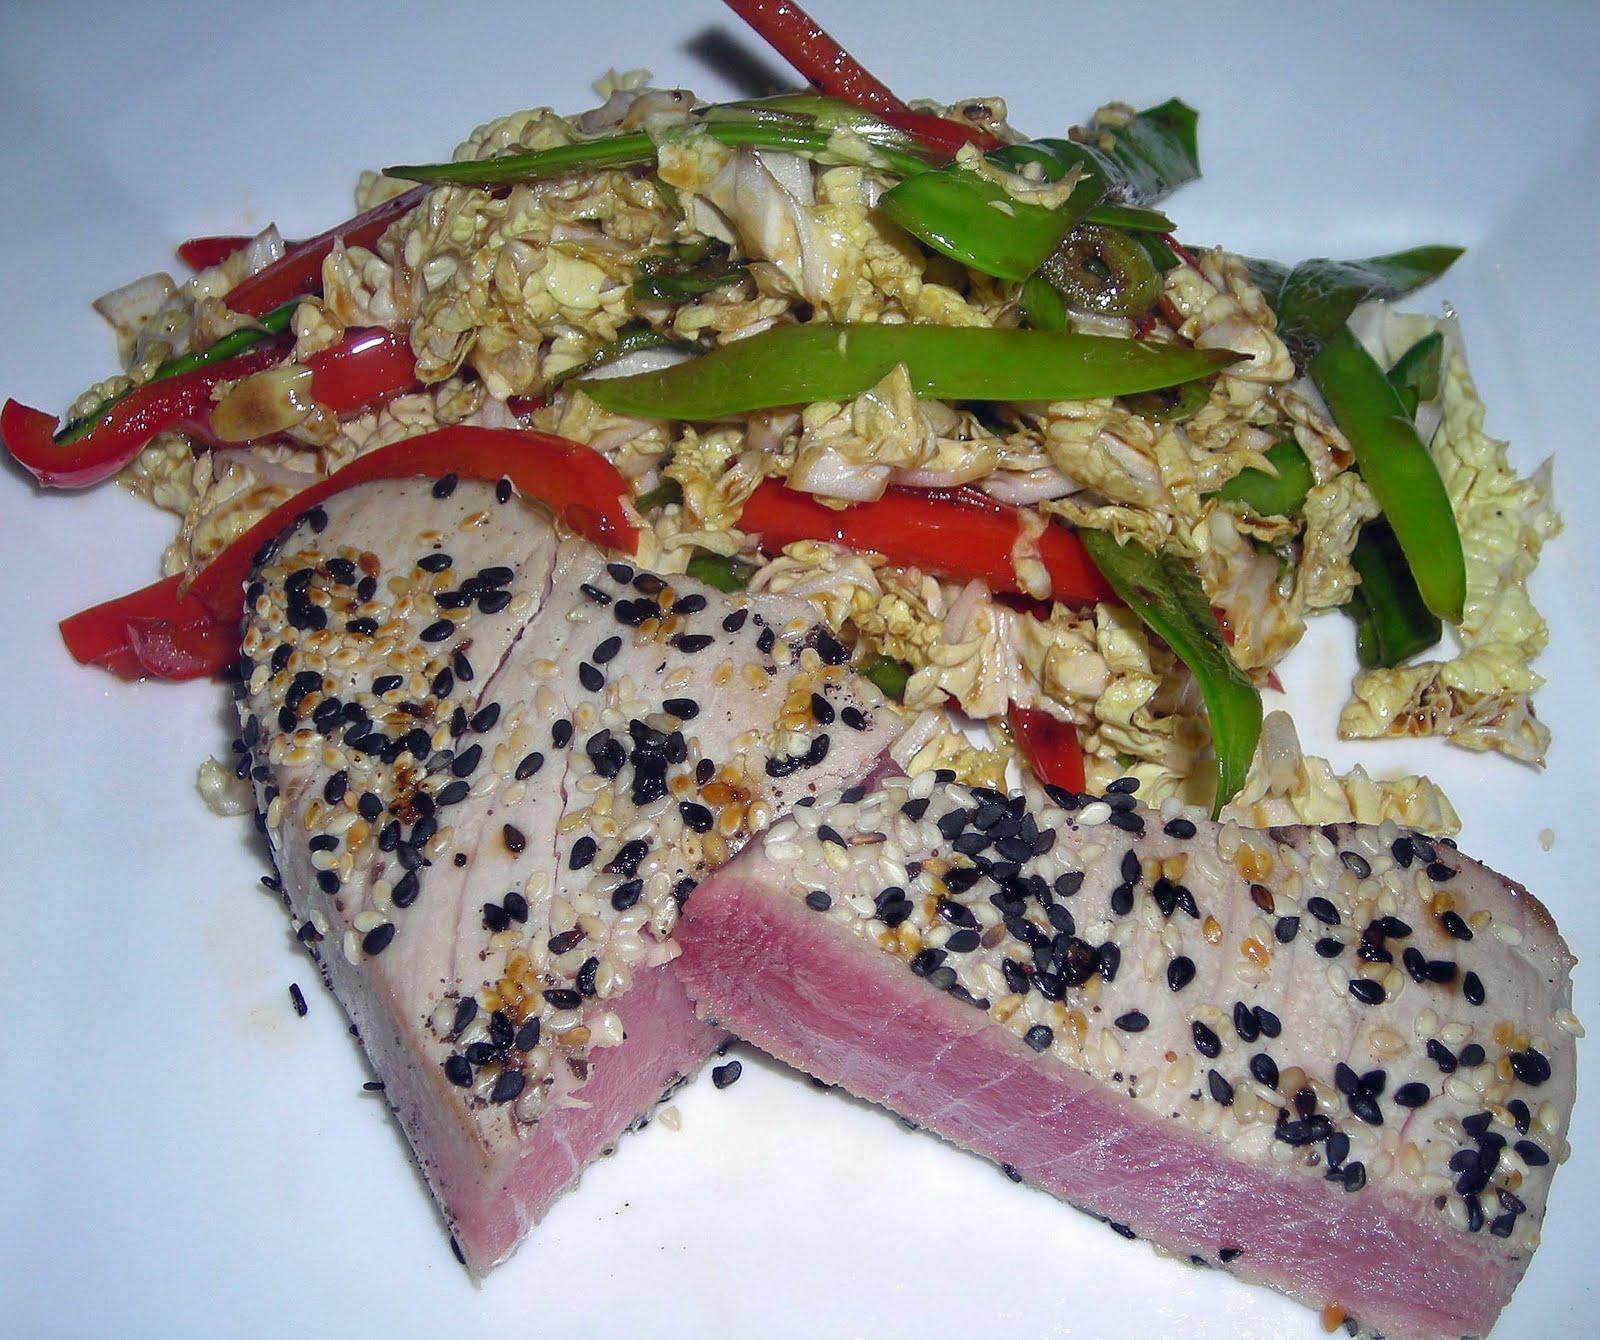 Seared Ahi Tuna With Wasabi Sauce Fresh tuna is meaty and lean